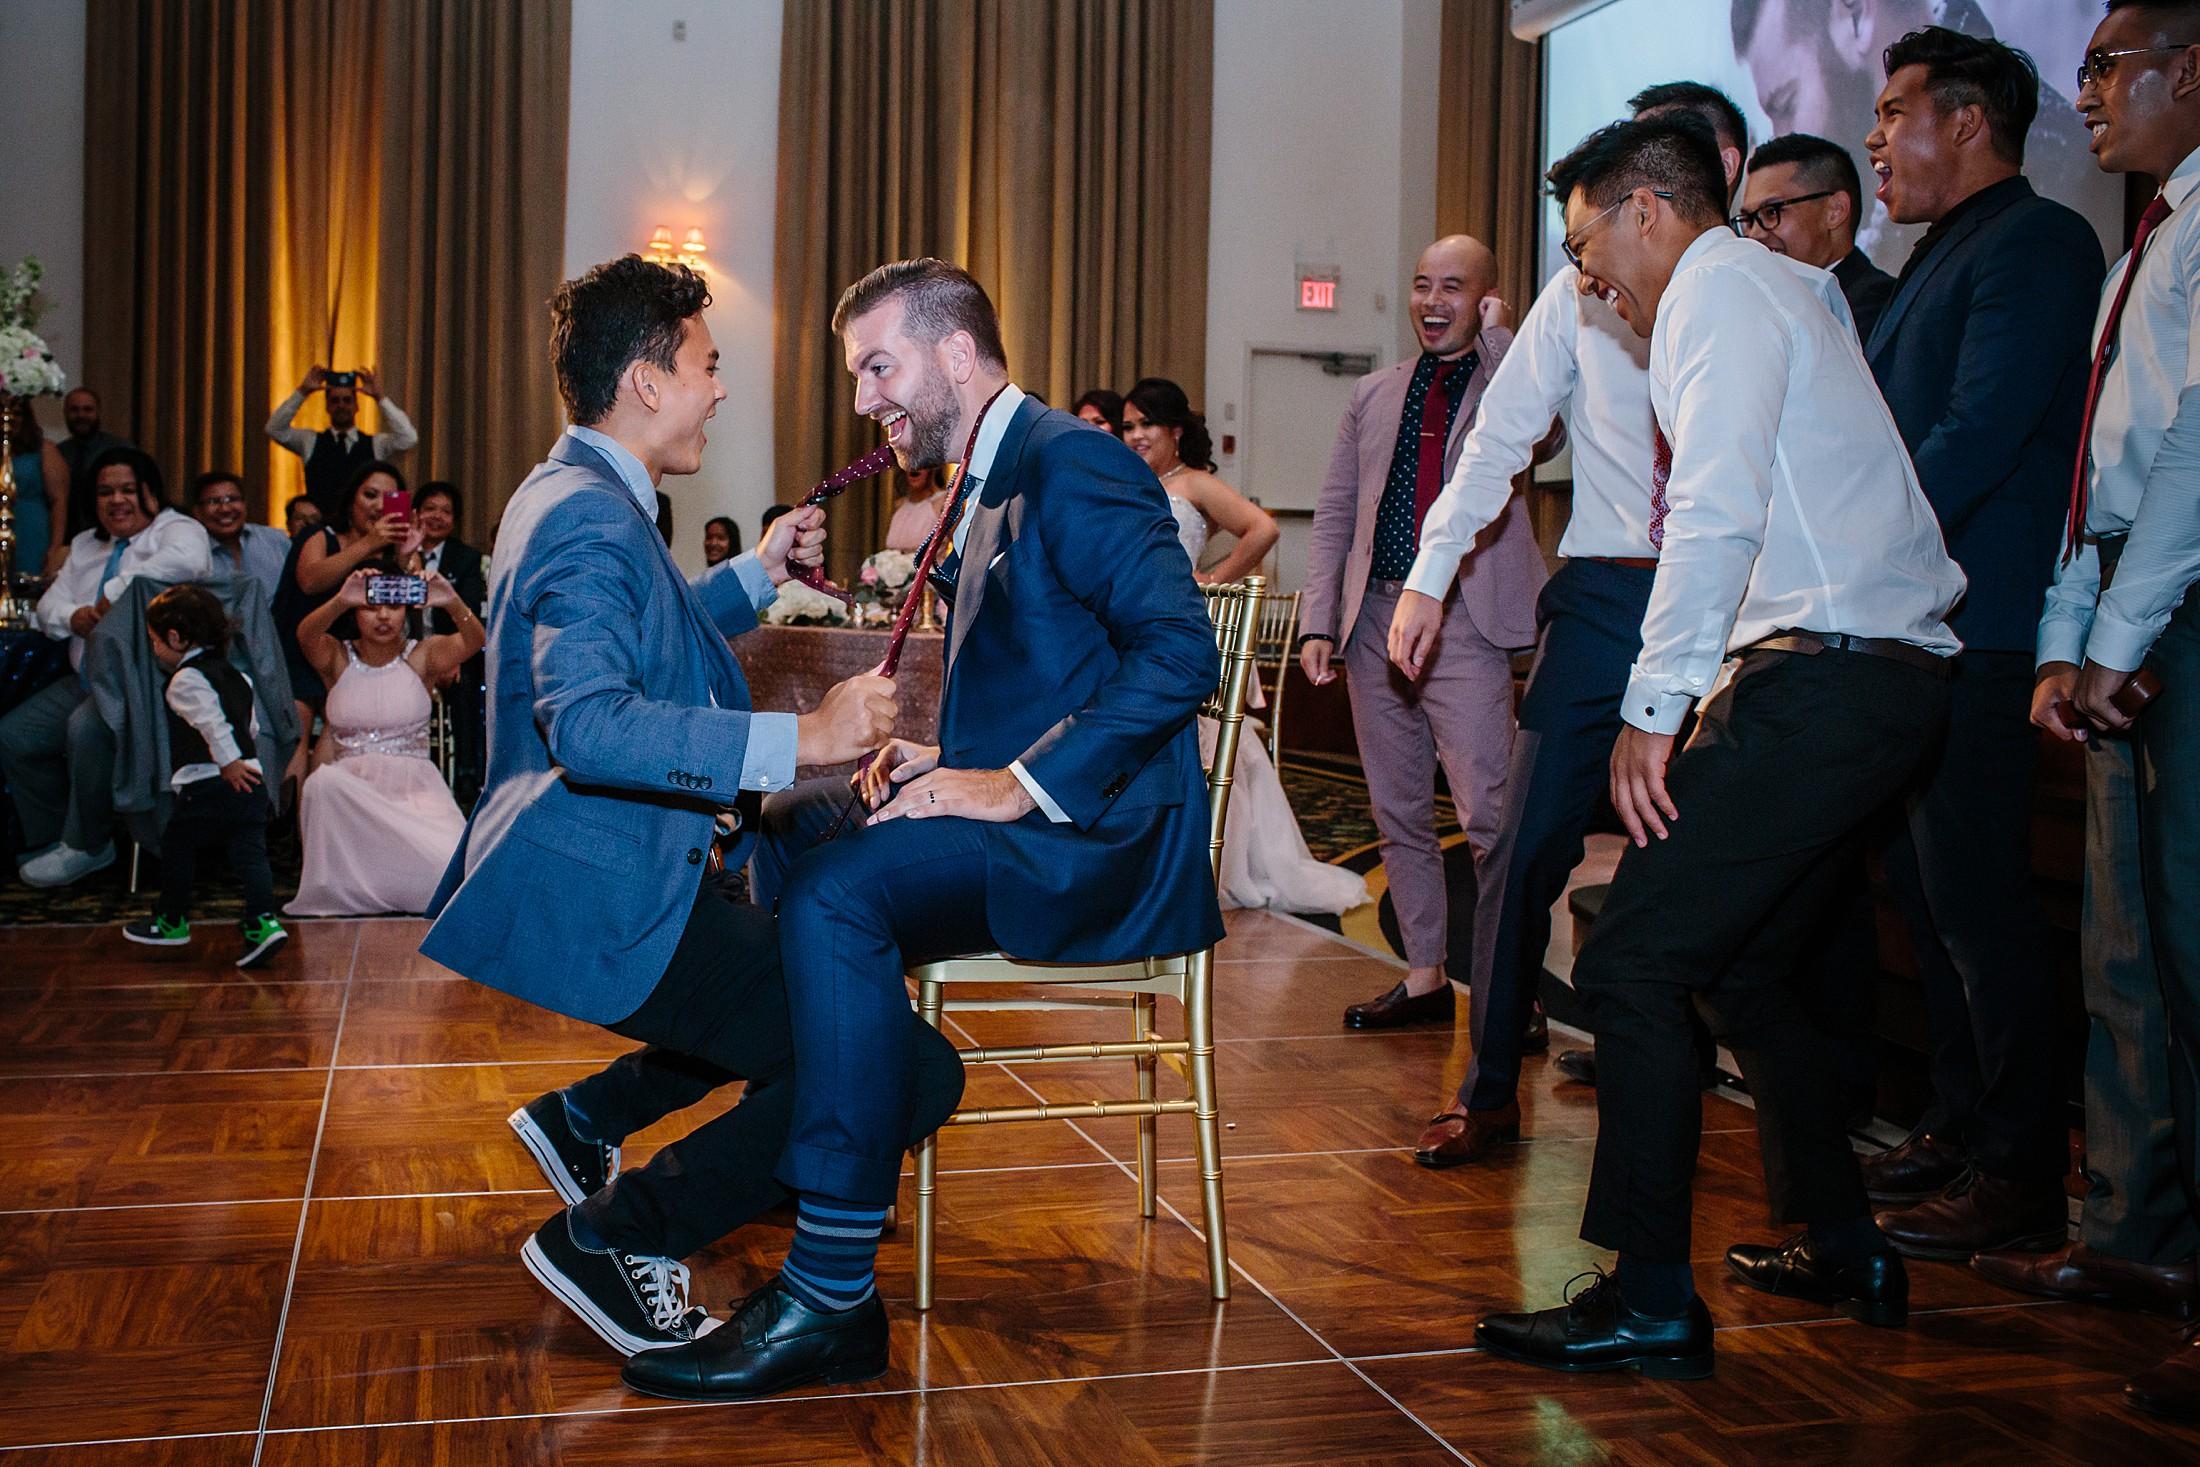 August18.VanessaDaniel0956 (1)_Note Photography Documentary Photographer Wedding Photos Vancouver B.C. Best of 2018 2019 2020 Vancouver Island Okanagan Banff Edmonton Victoria.jpg